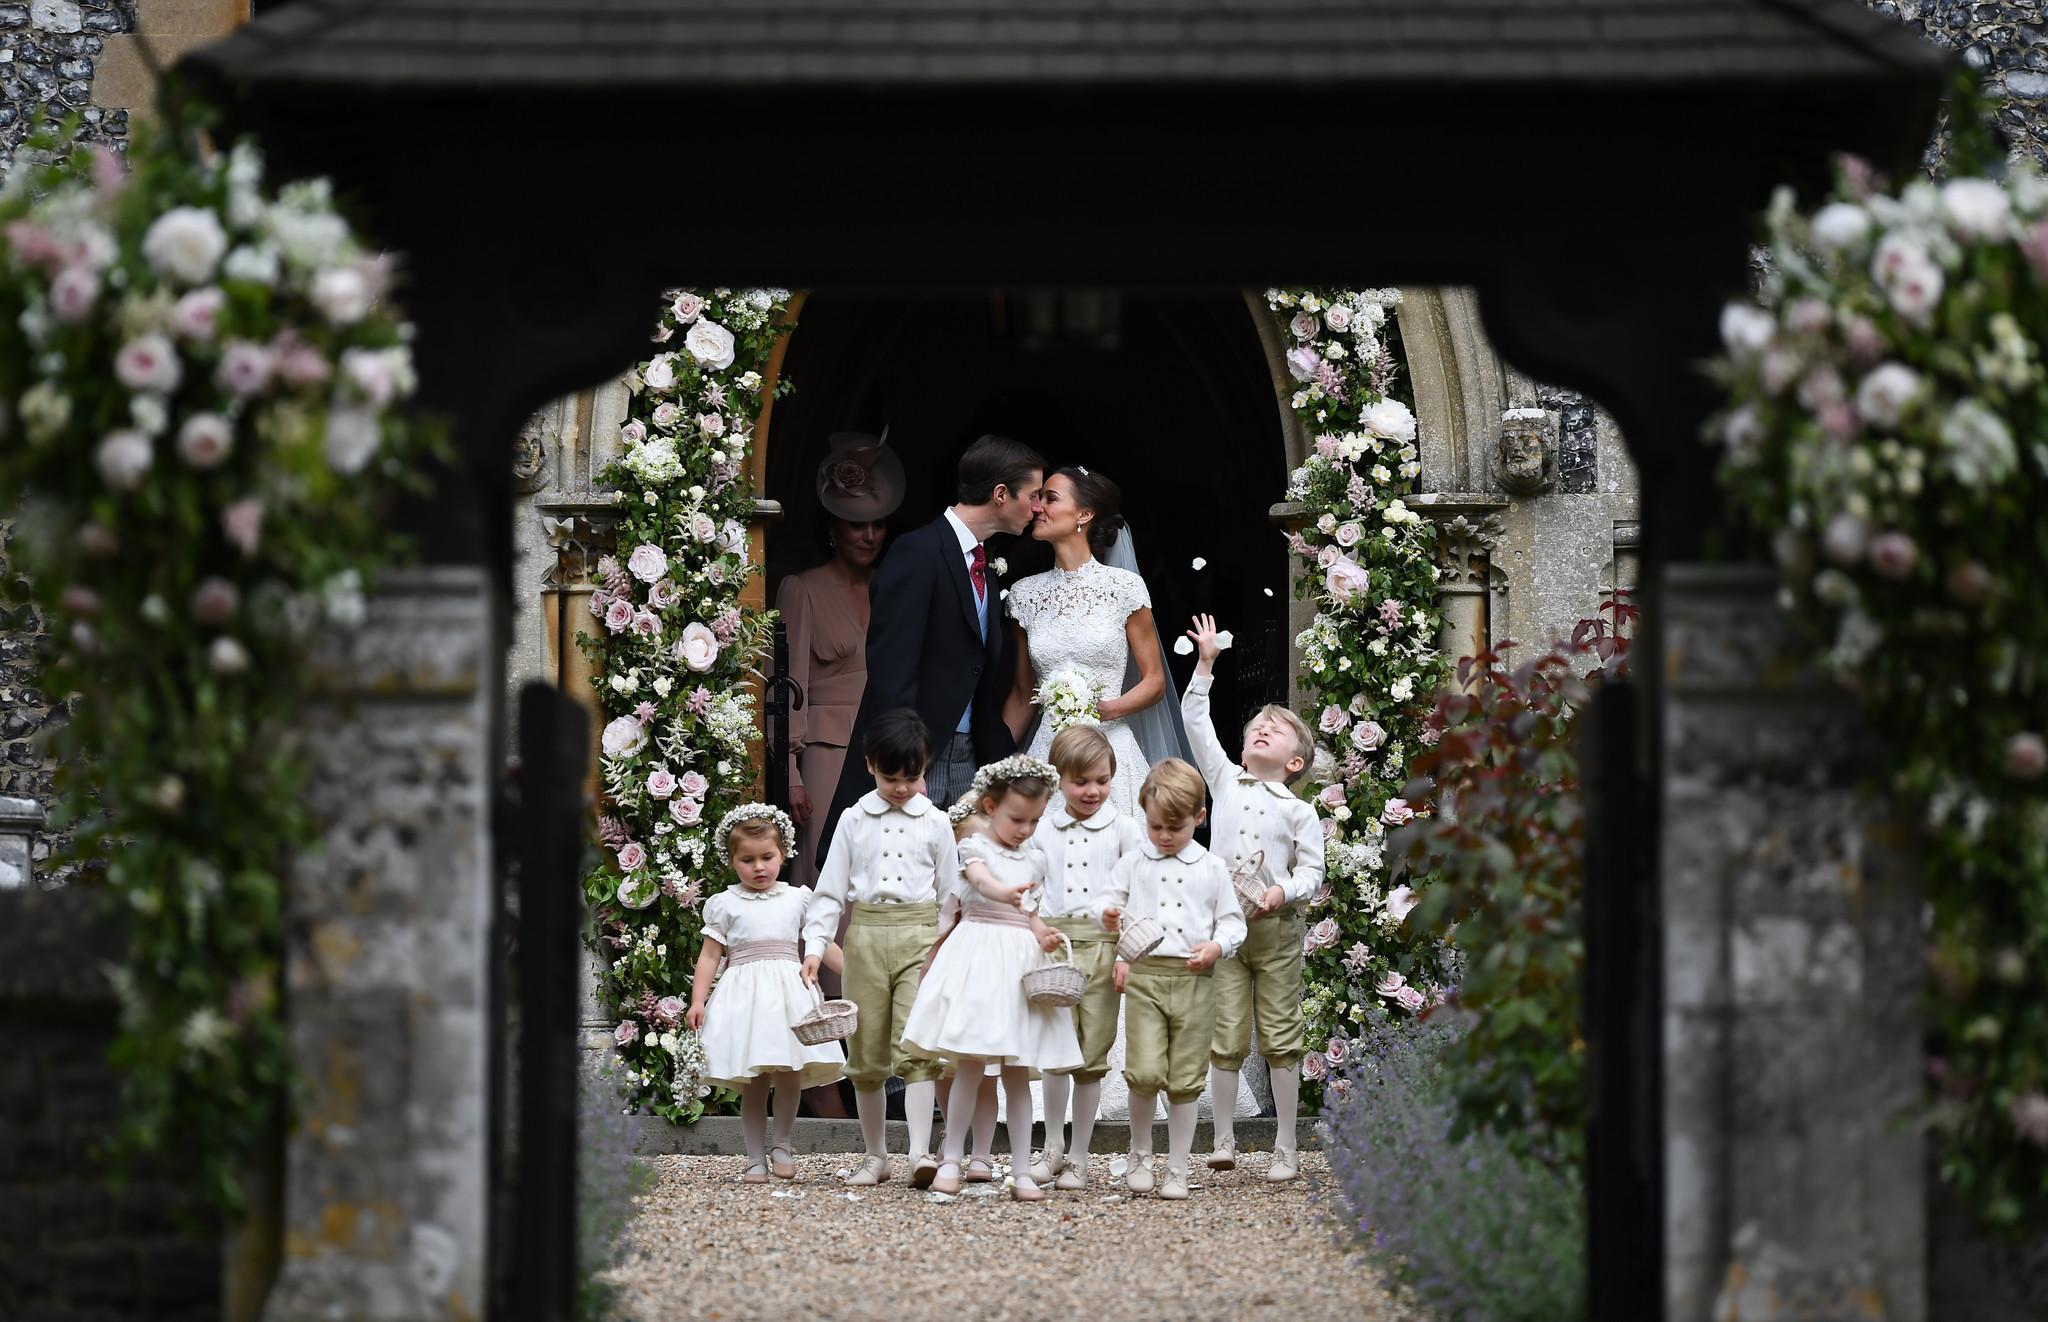 Michael tortora wedding